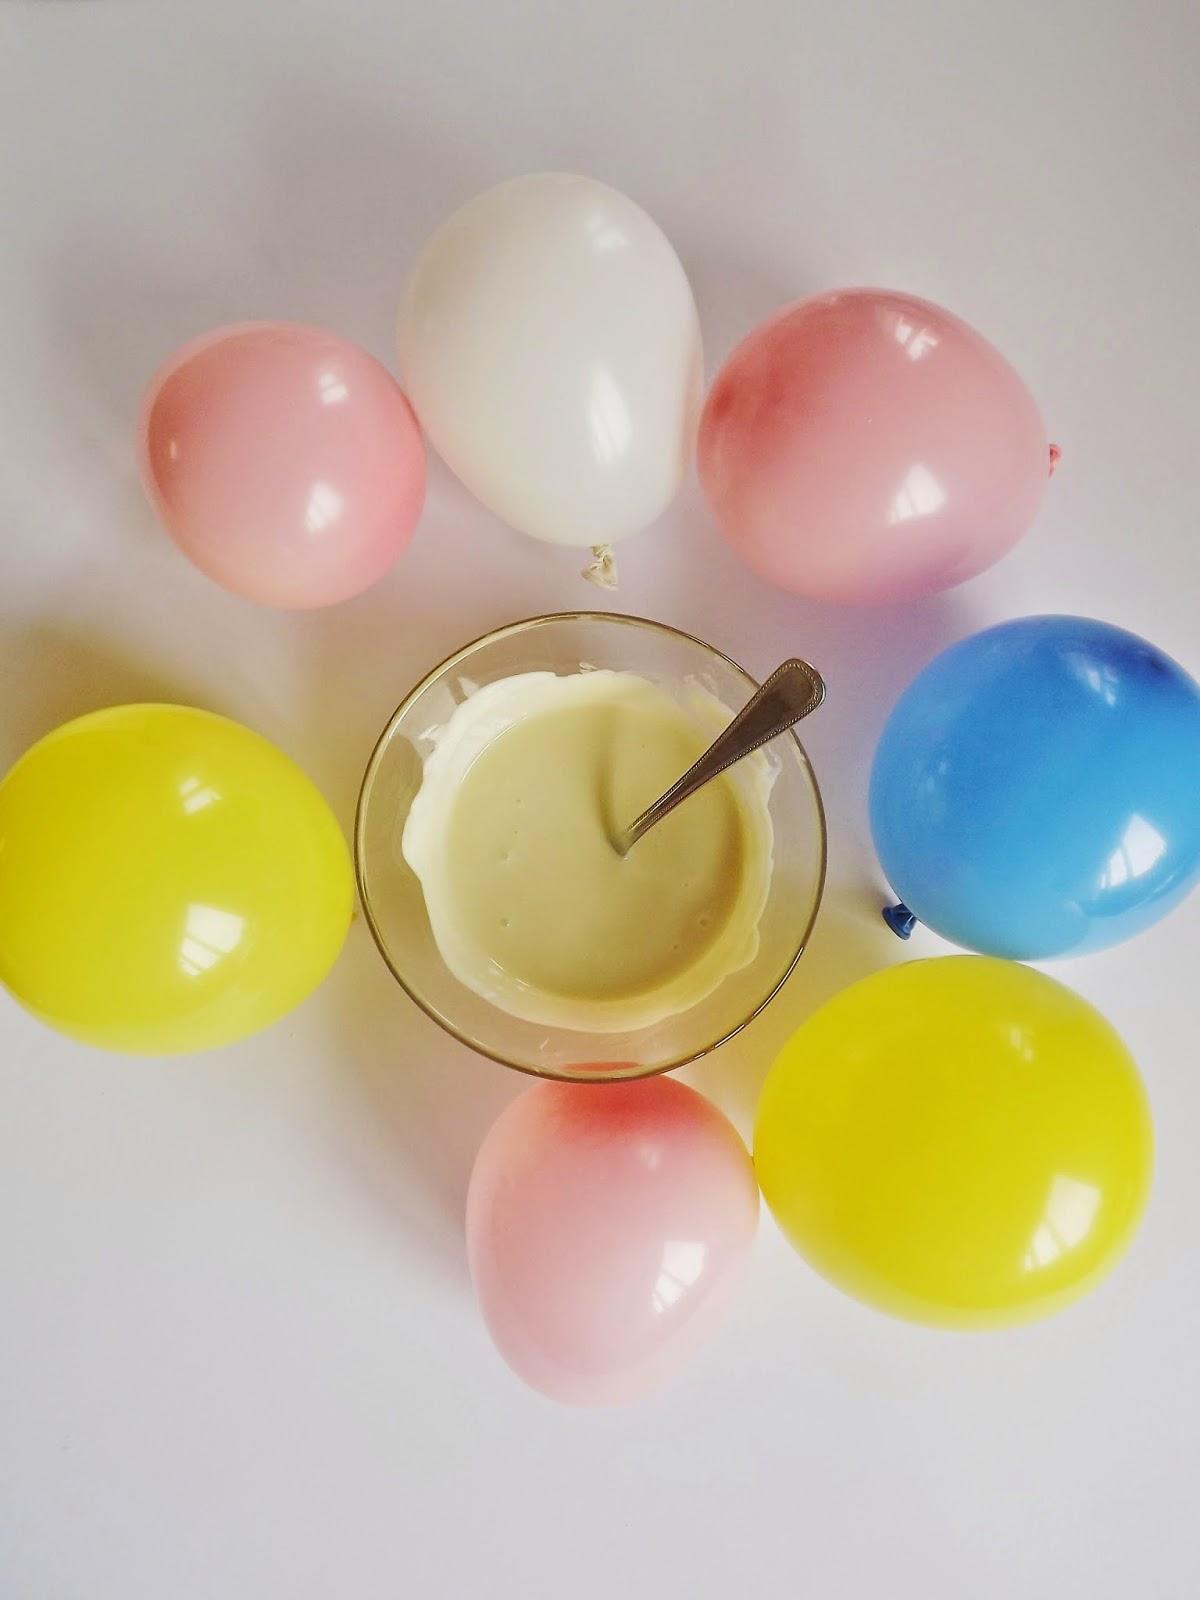 Balloon dipping craft